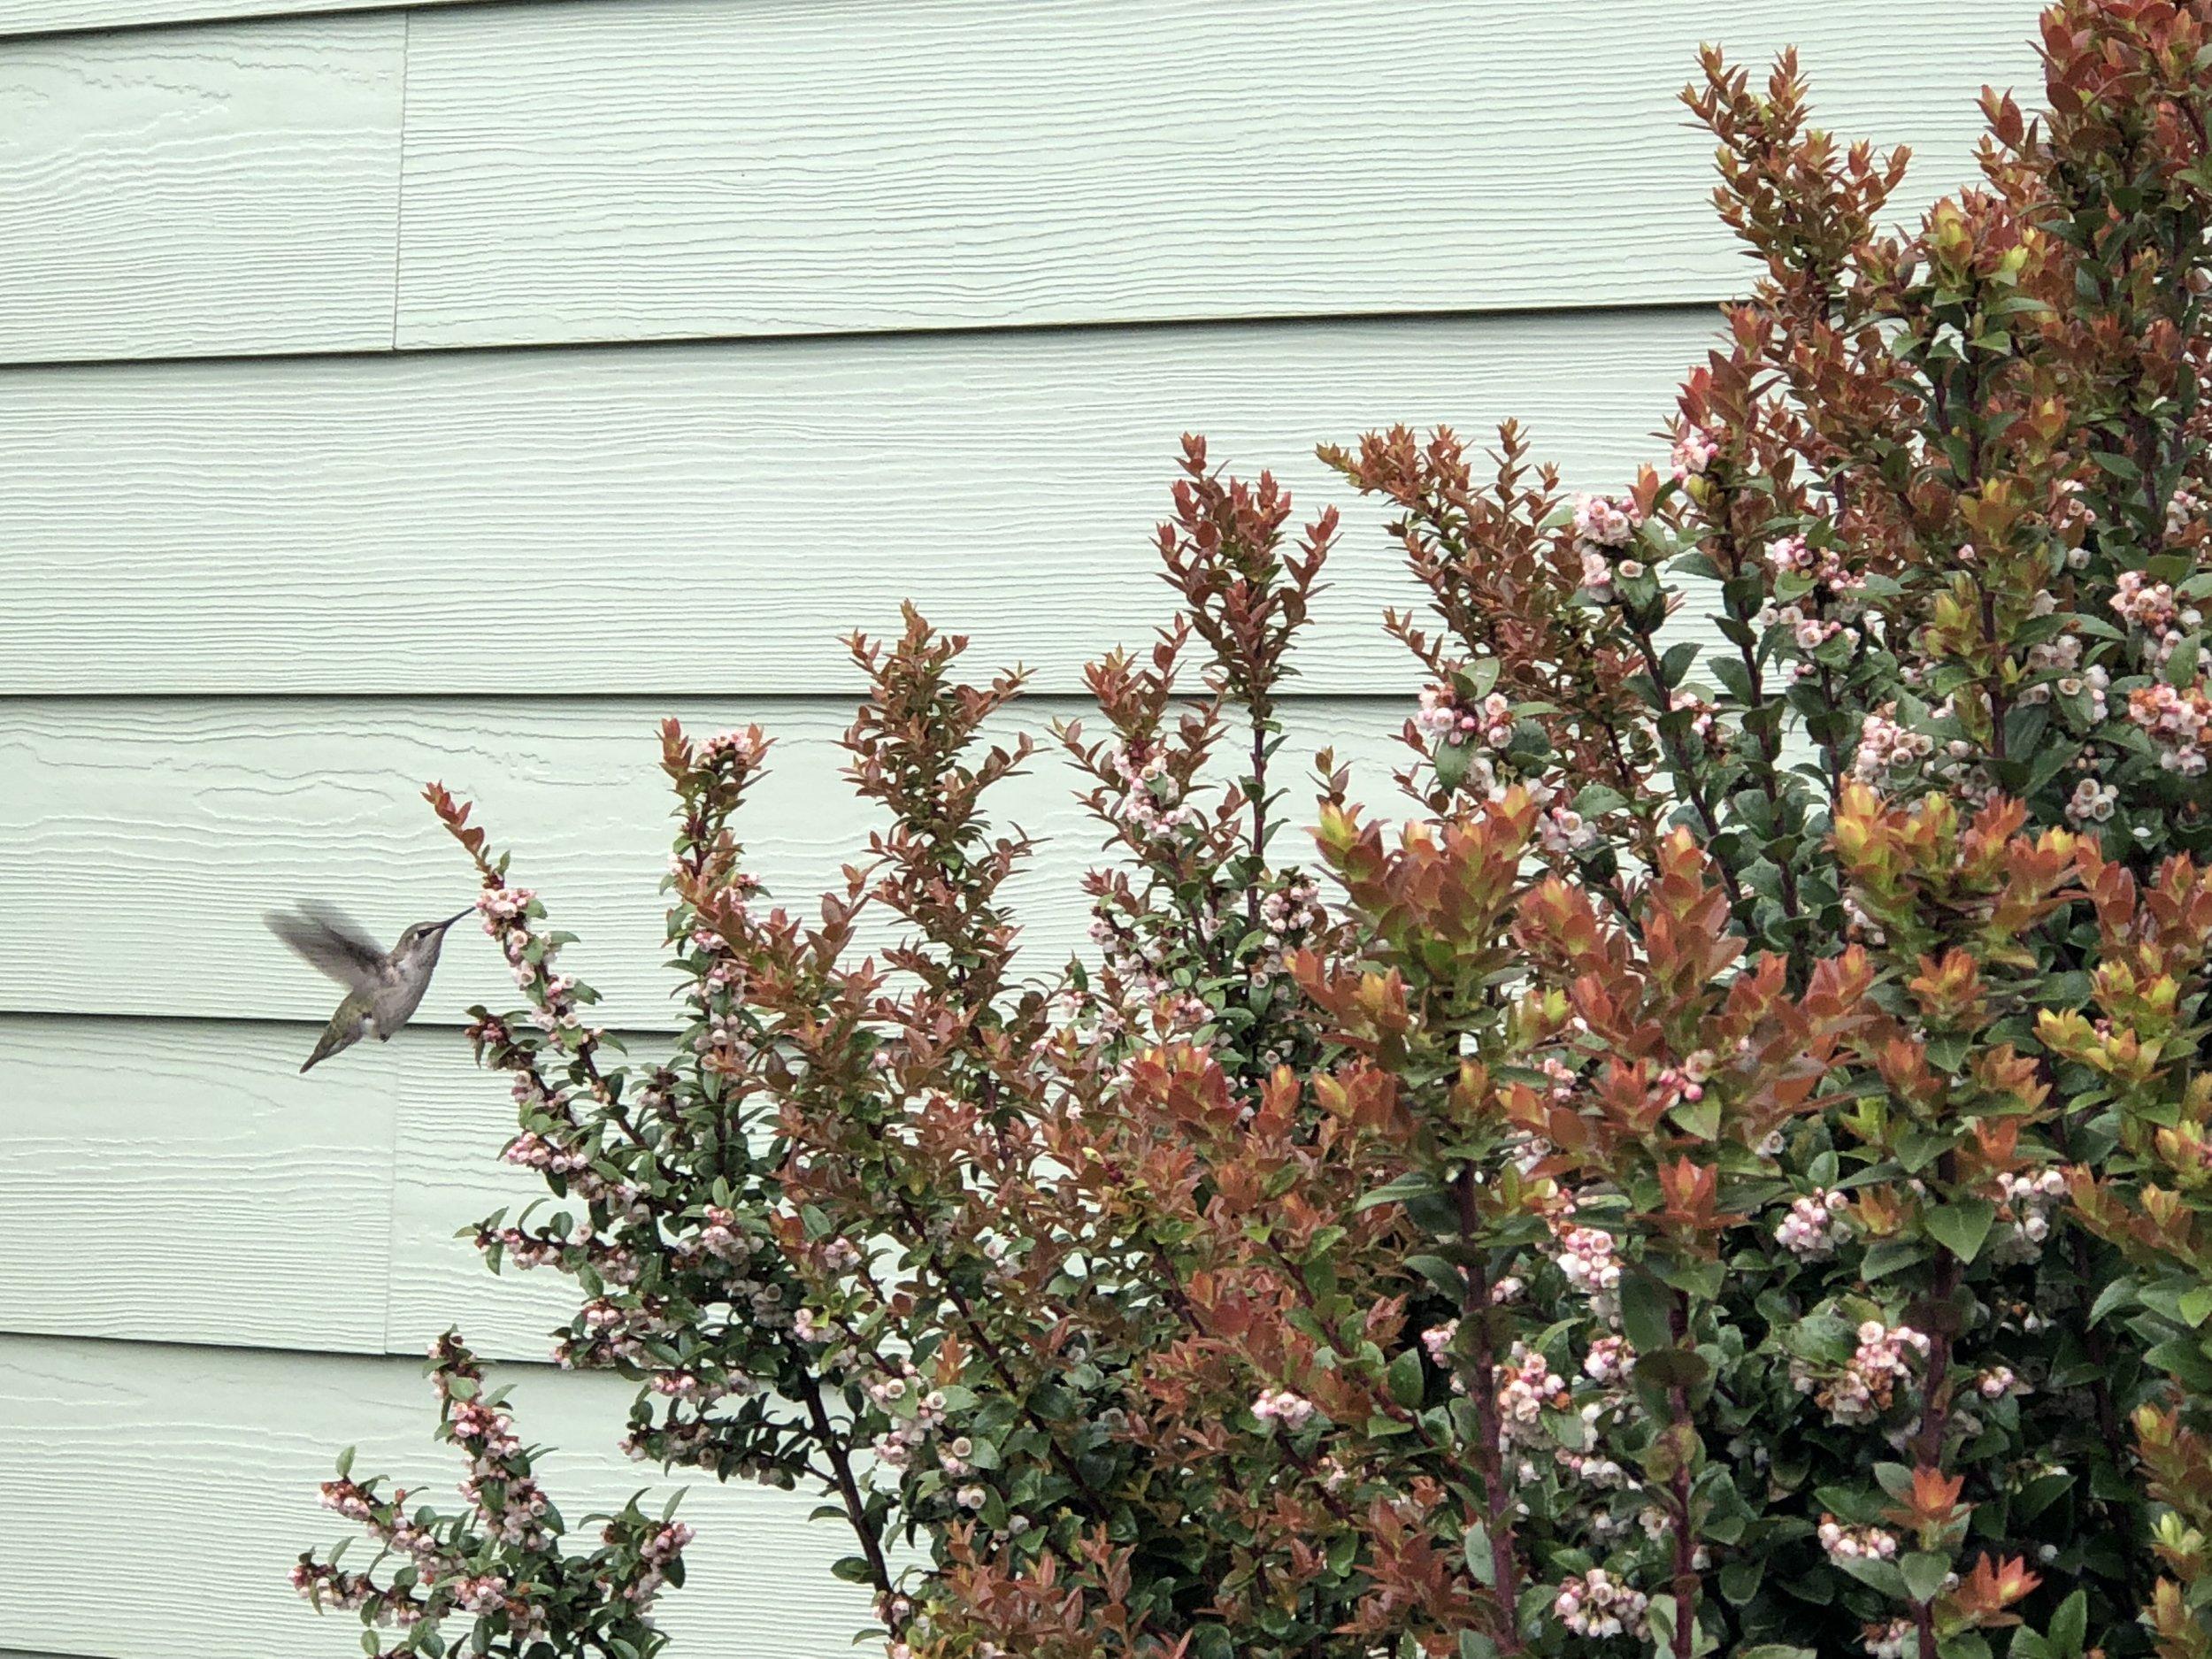 Hummingbird in the evergreen huckleberry.